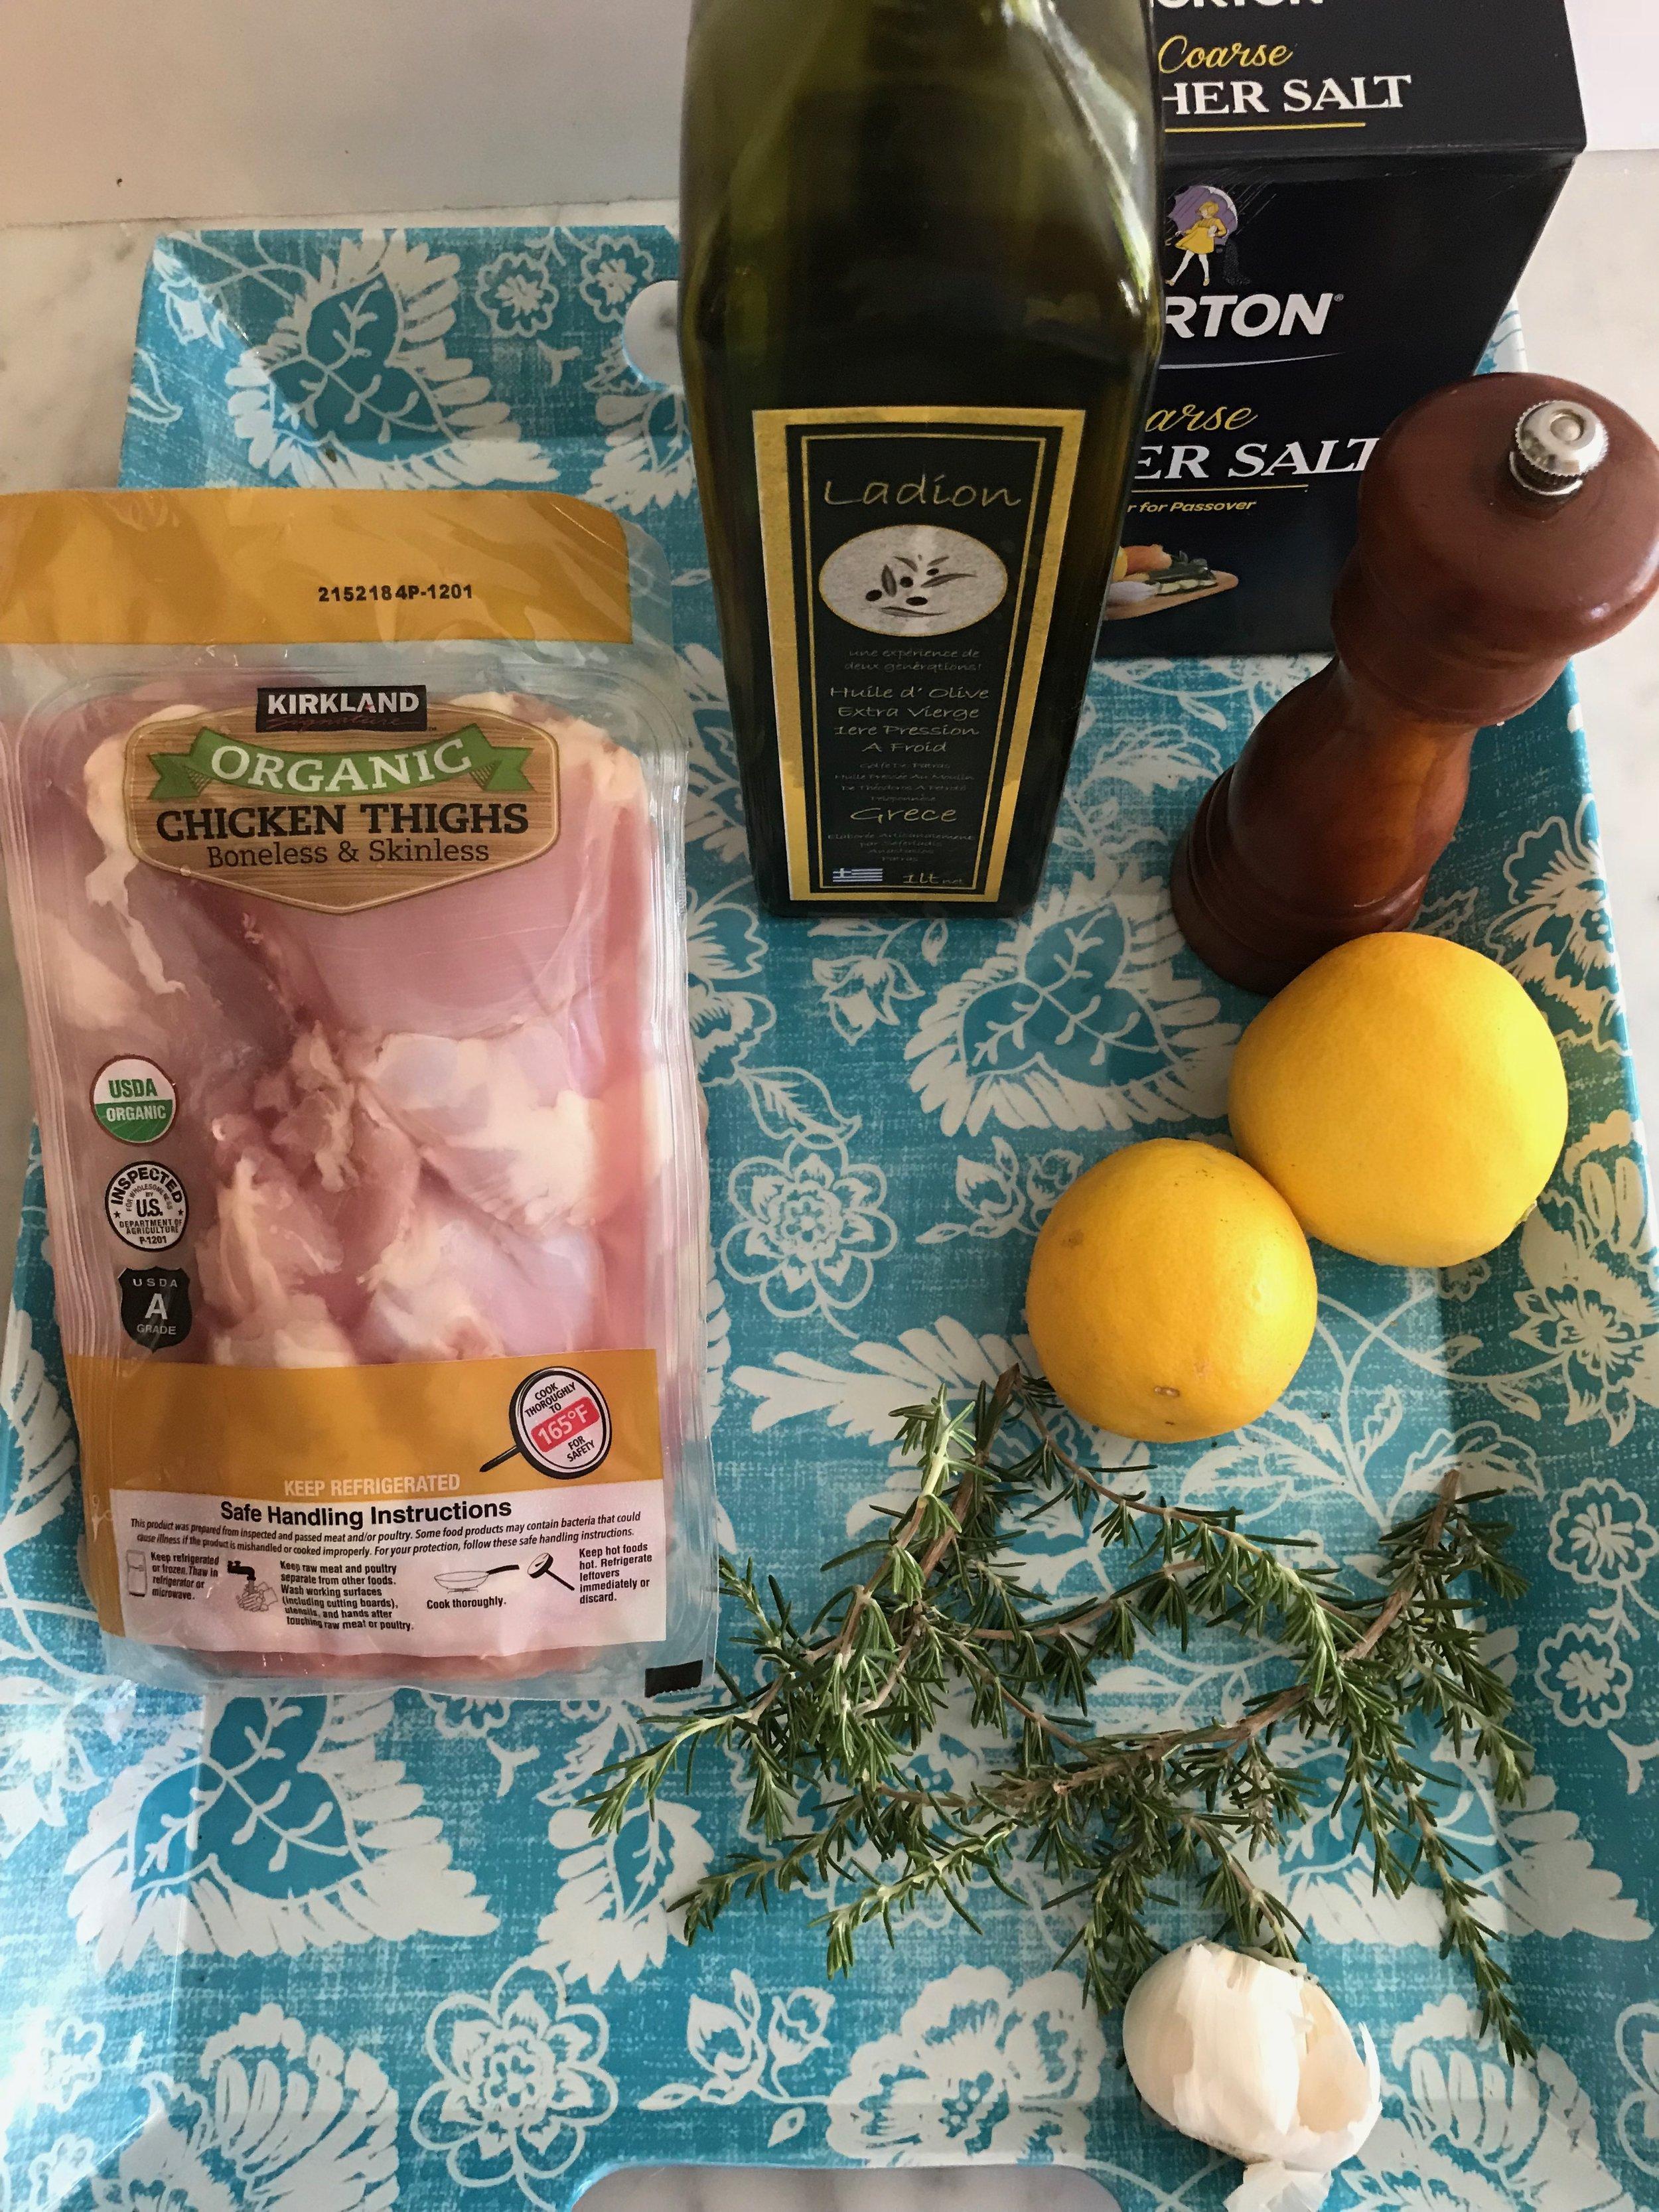 Ingredients - 3 lbs. boneless, skinless chicken thighs2 tsp. fresh rosemary, finely chopped2 cloves garlic, crushed1T lemon zest¼ cup lemon juice¼ cup olive oilSalt & pepper